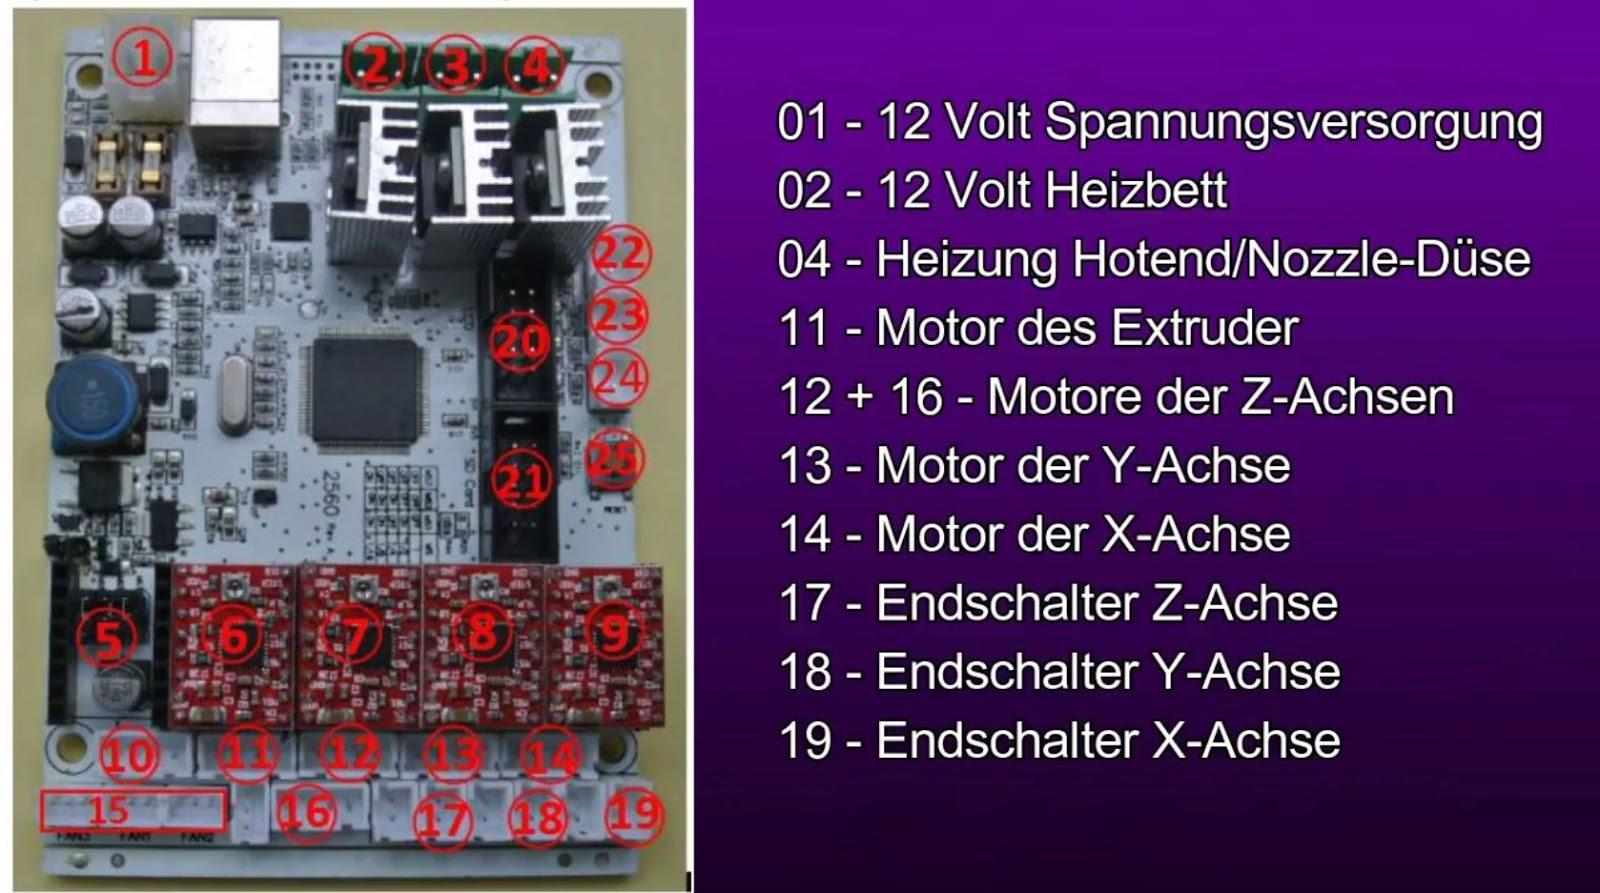 Mein Elektronik Hobby: Mai 2017